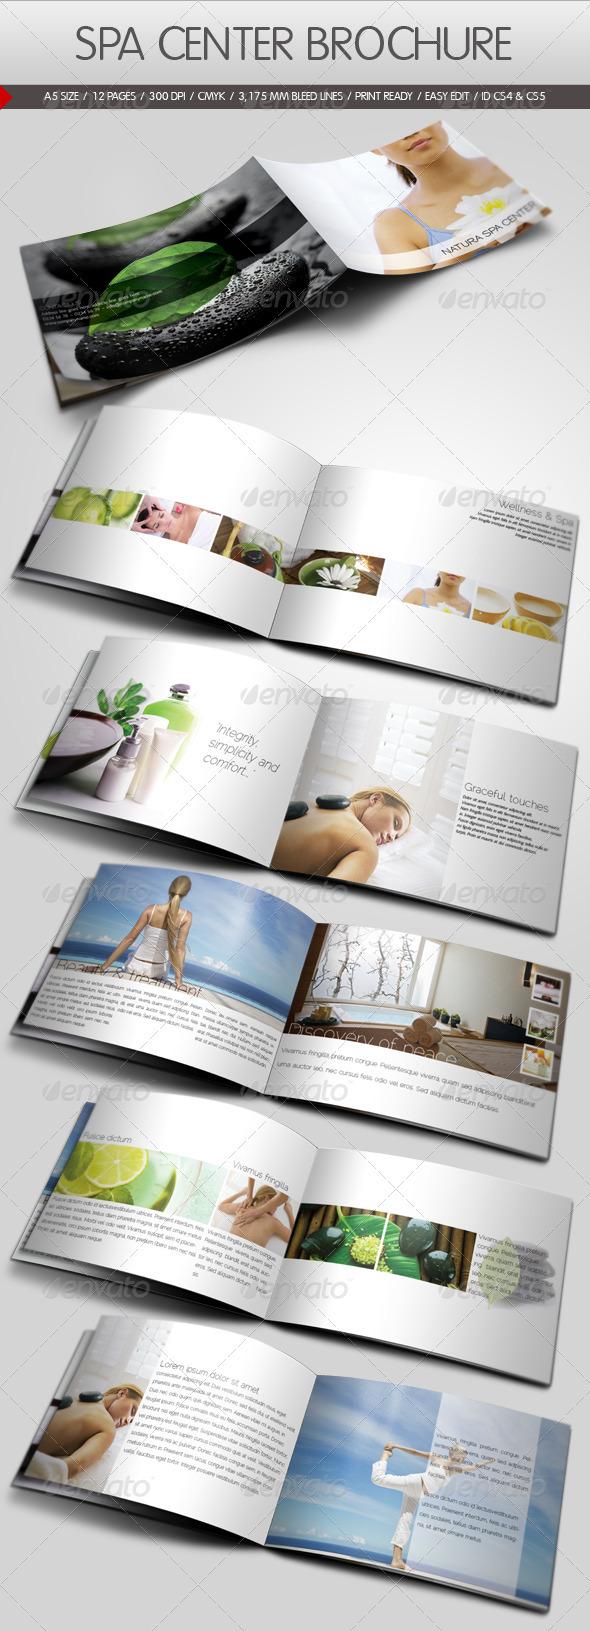 Spa Center Brochure Template - Corporate Brochures